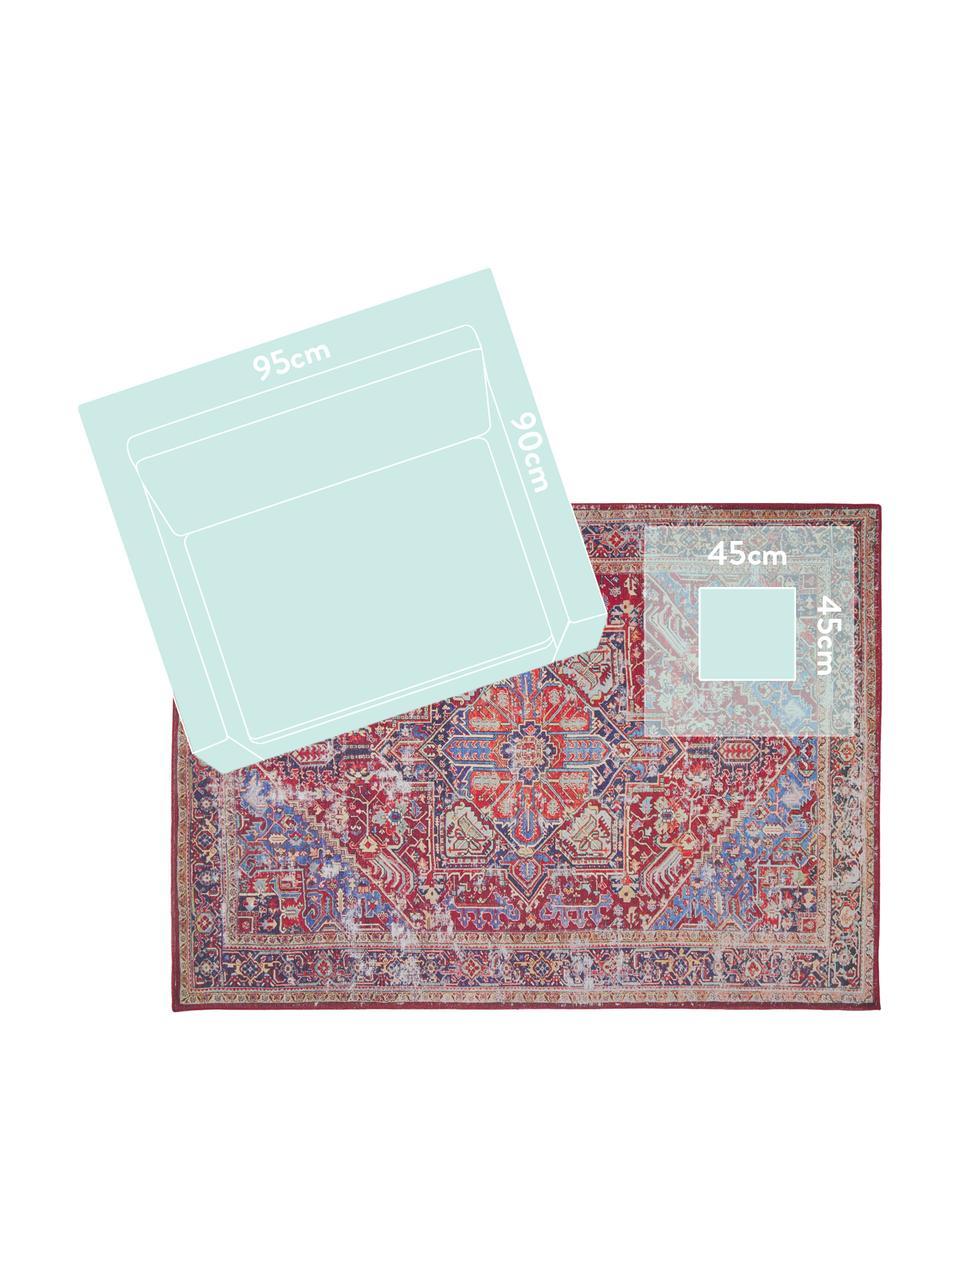 Chenille vloerkleed Paulo in vintage stijl, Bovenzijde: chenille (100% polyester), Onderzijde: 75% polykatoen, 25% polye, Rood, blauw, beige, B 190 x L 290 cm (maat L)